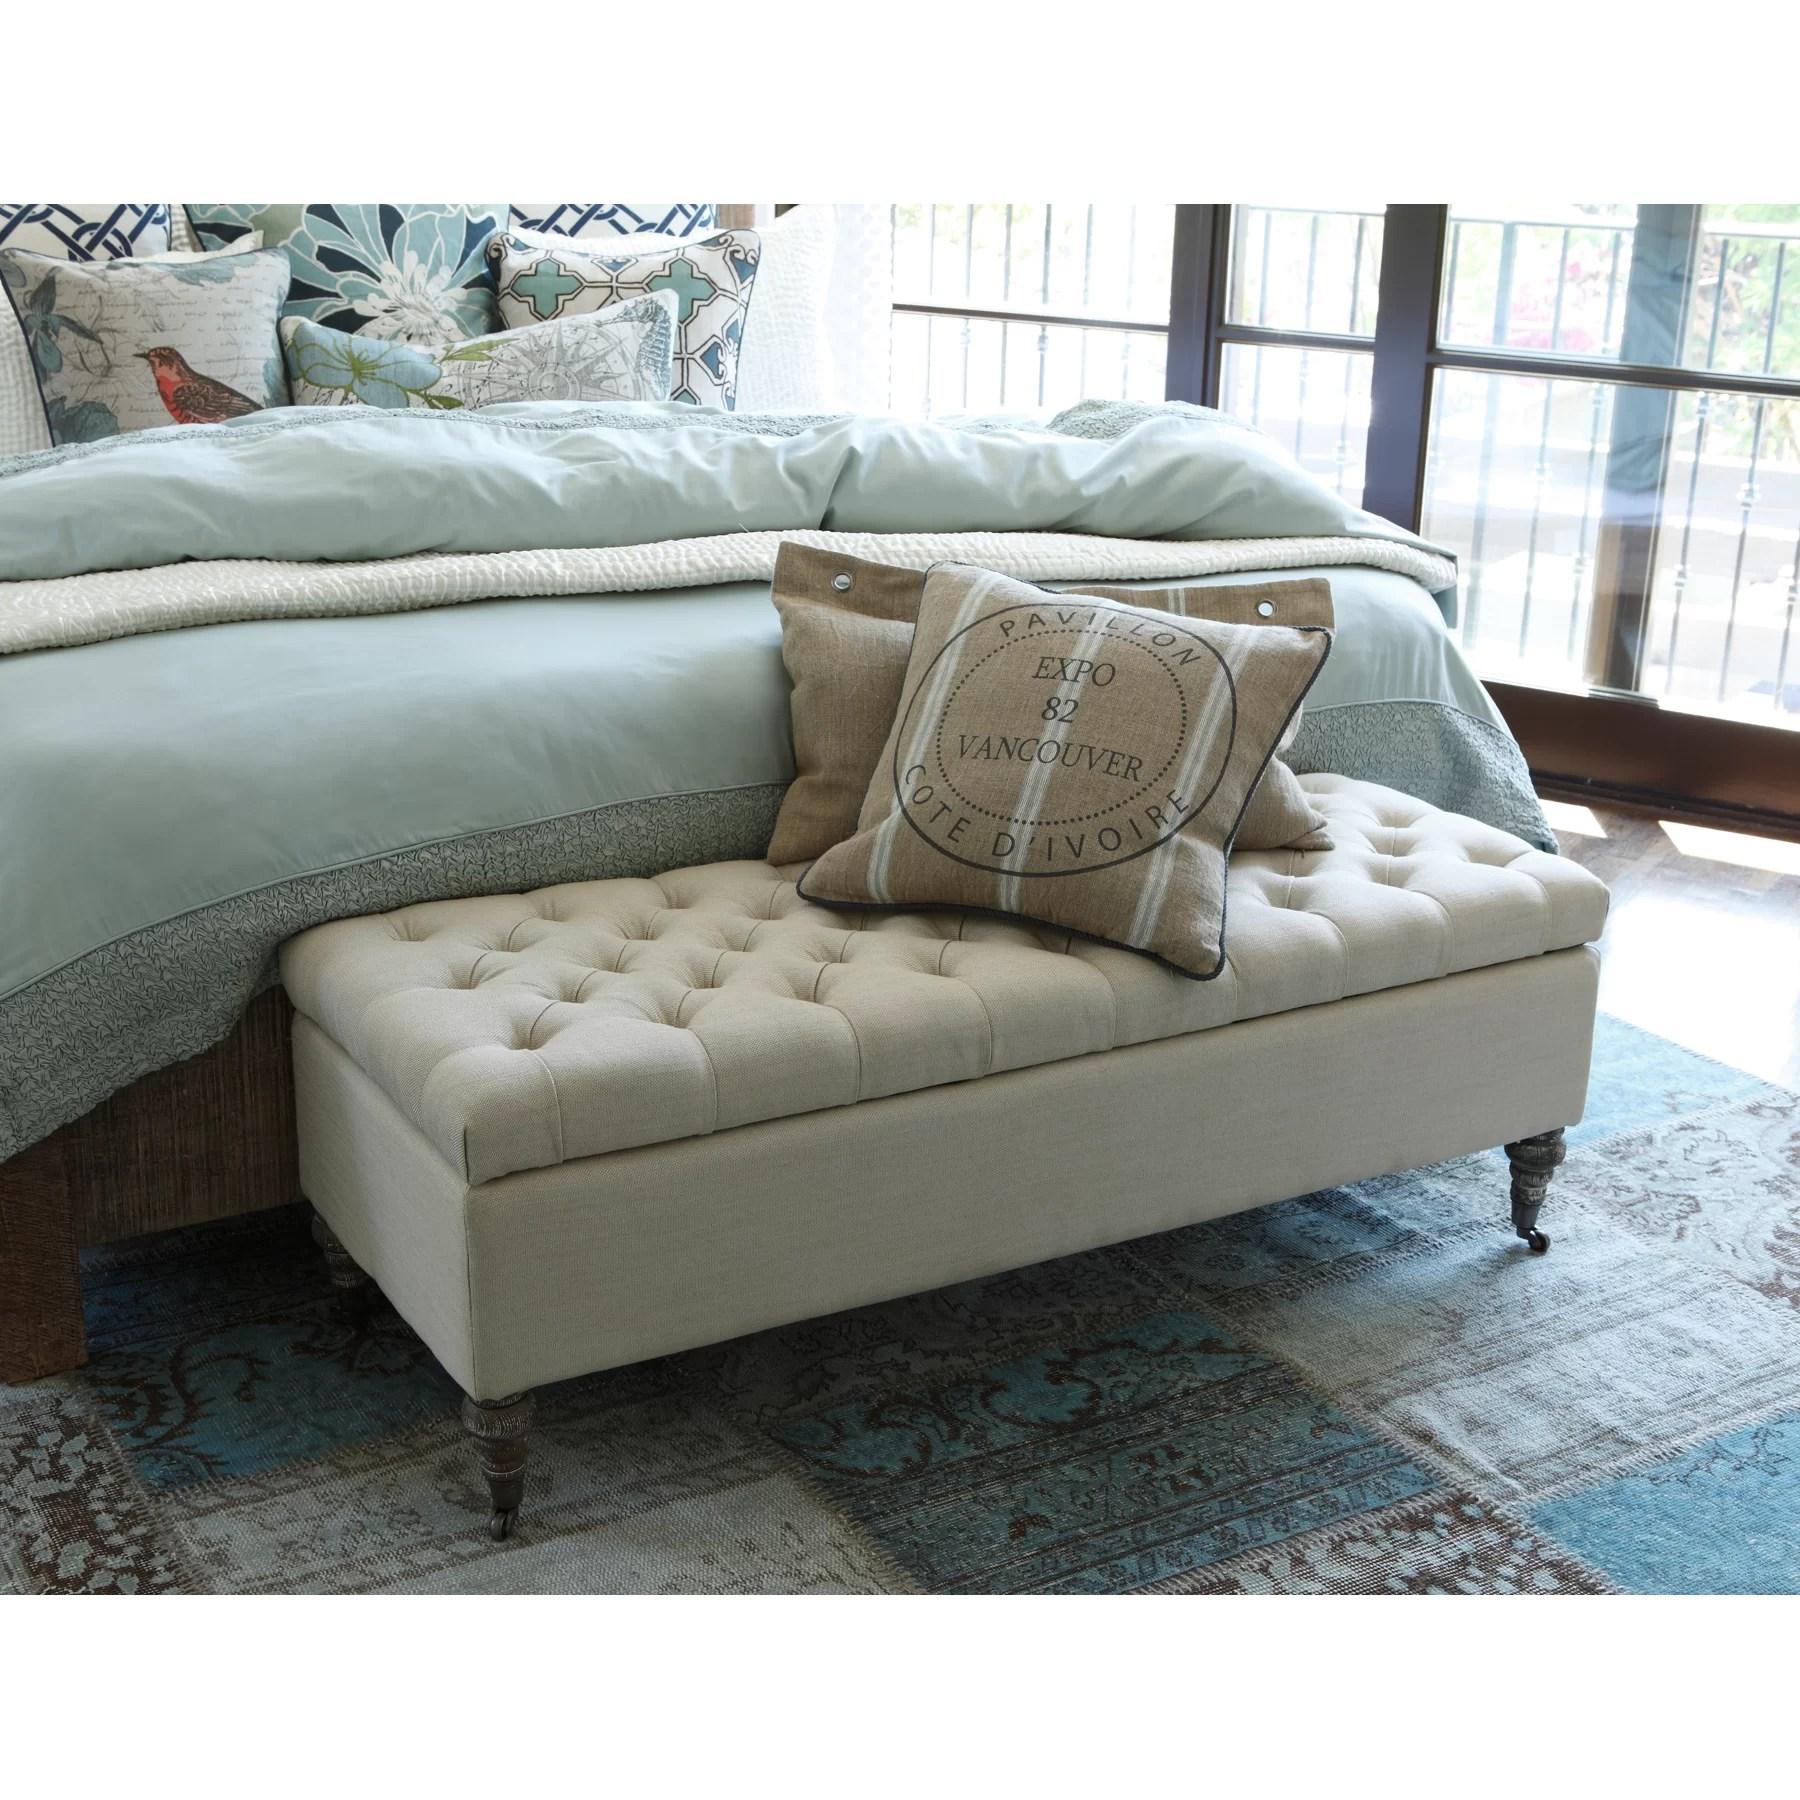 Kosas Home Fabric Storage Bedroom Bench  Reviews  Wayfair